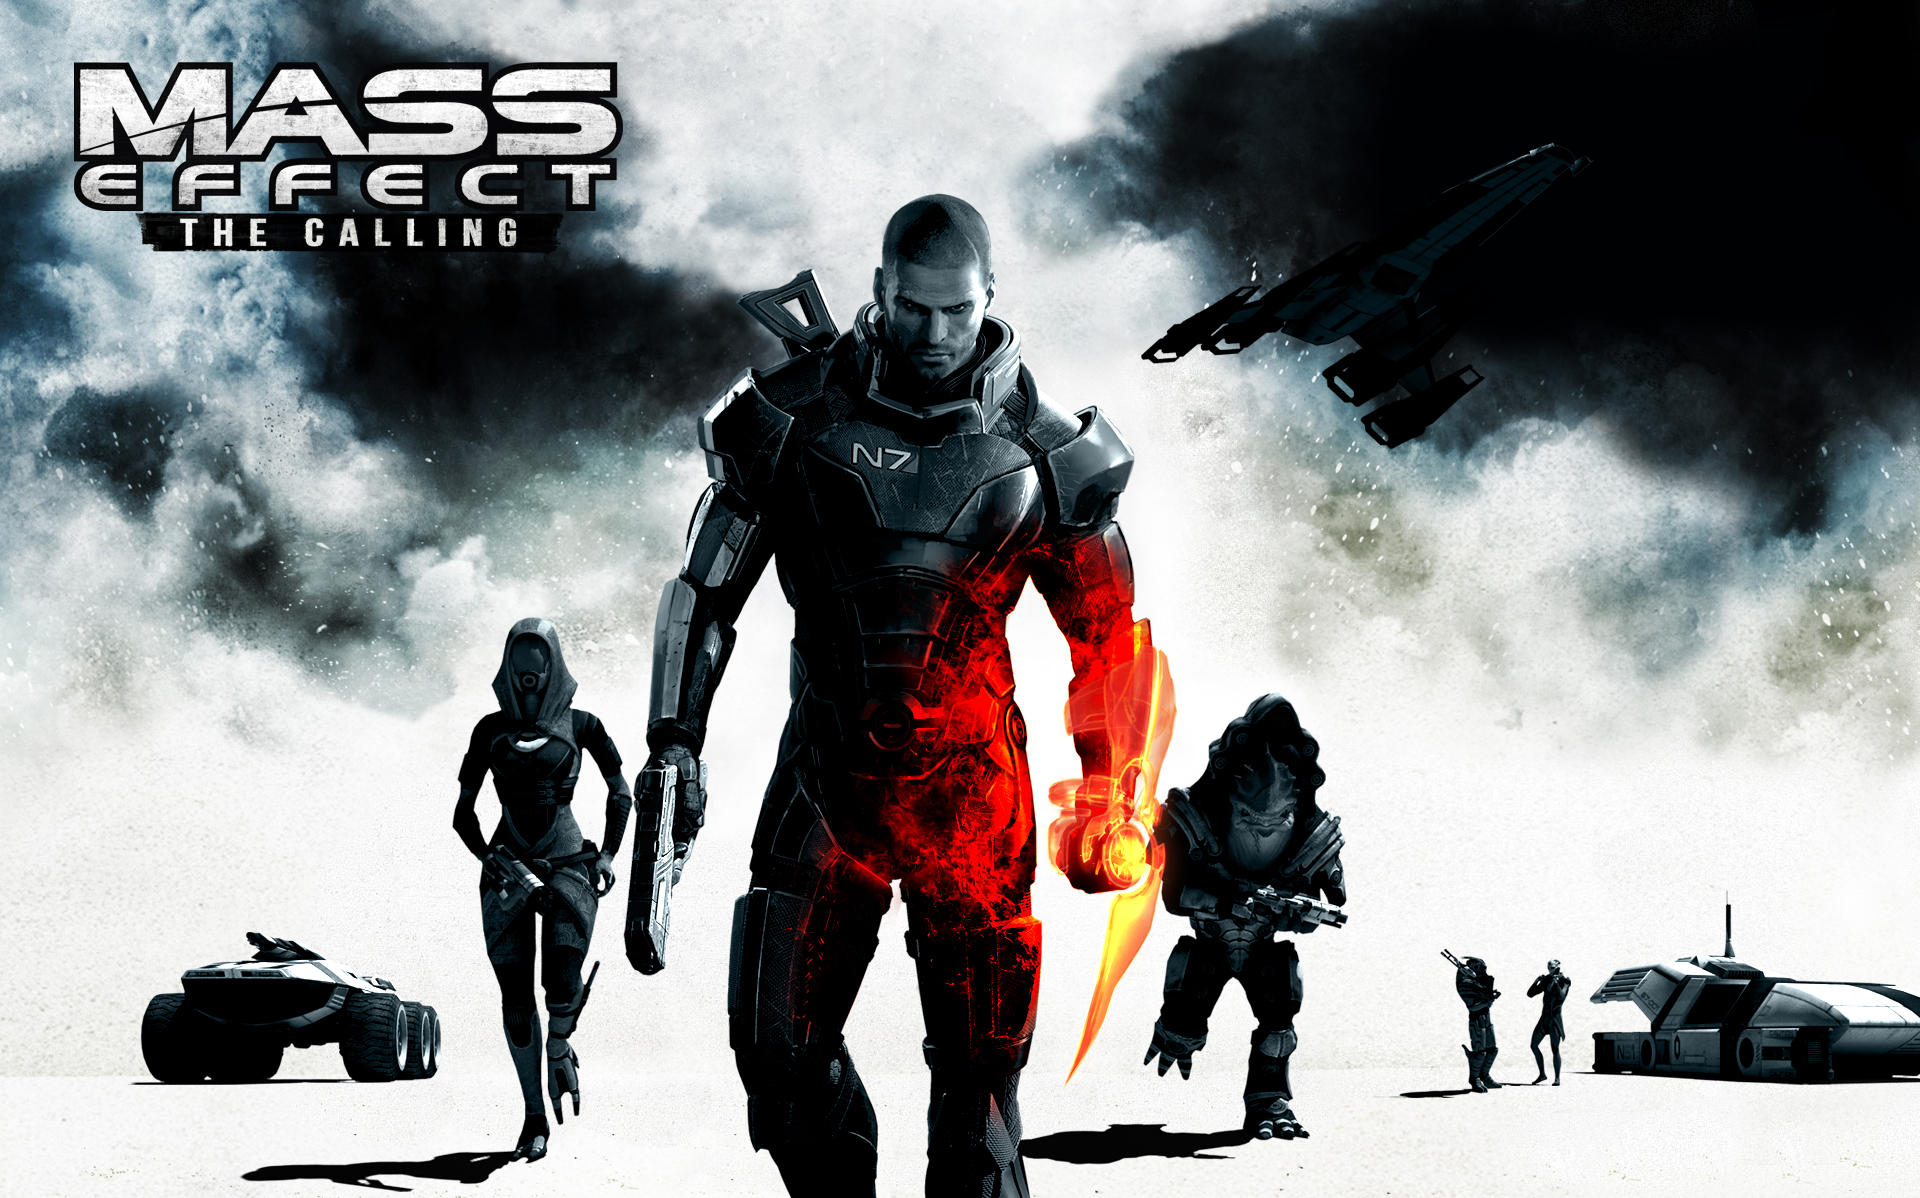 Mass Effect - The Calling